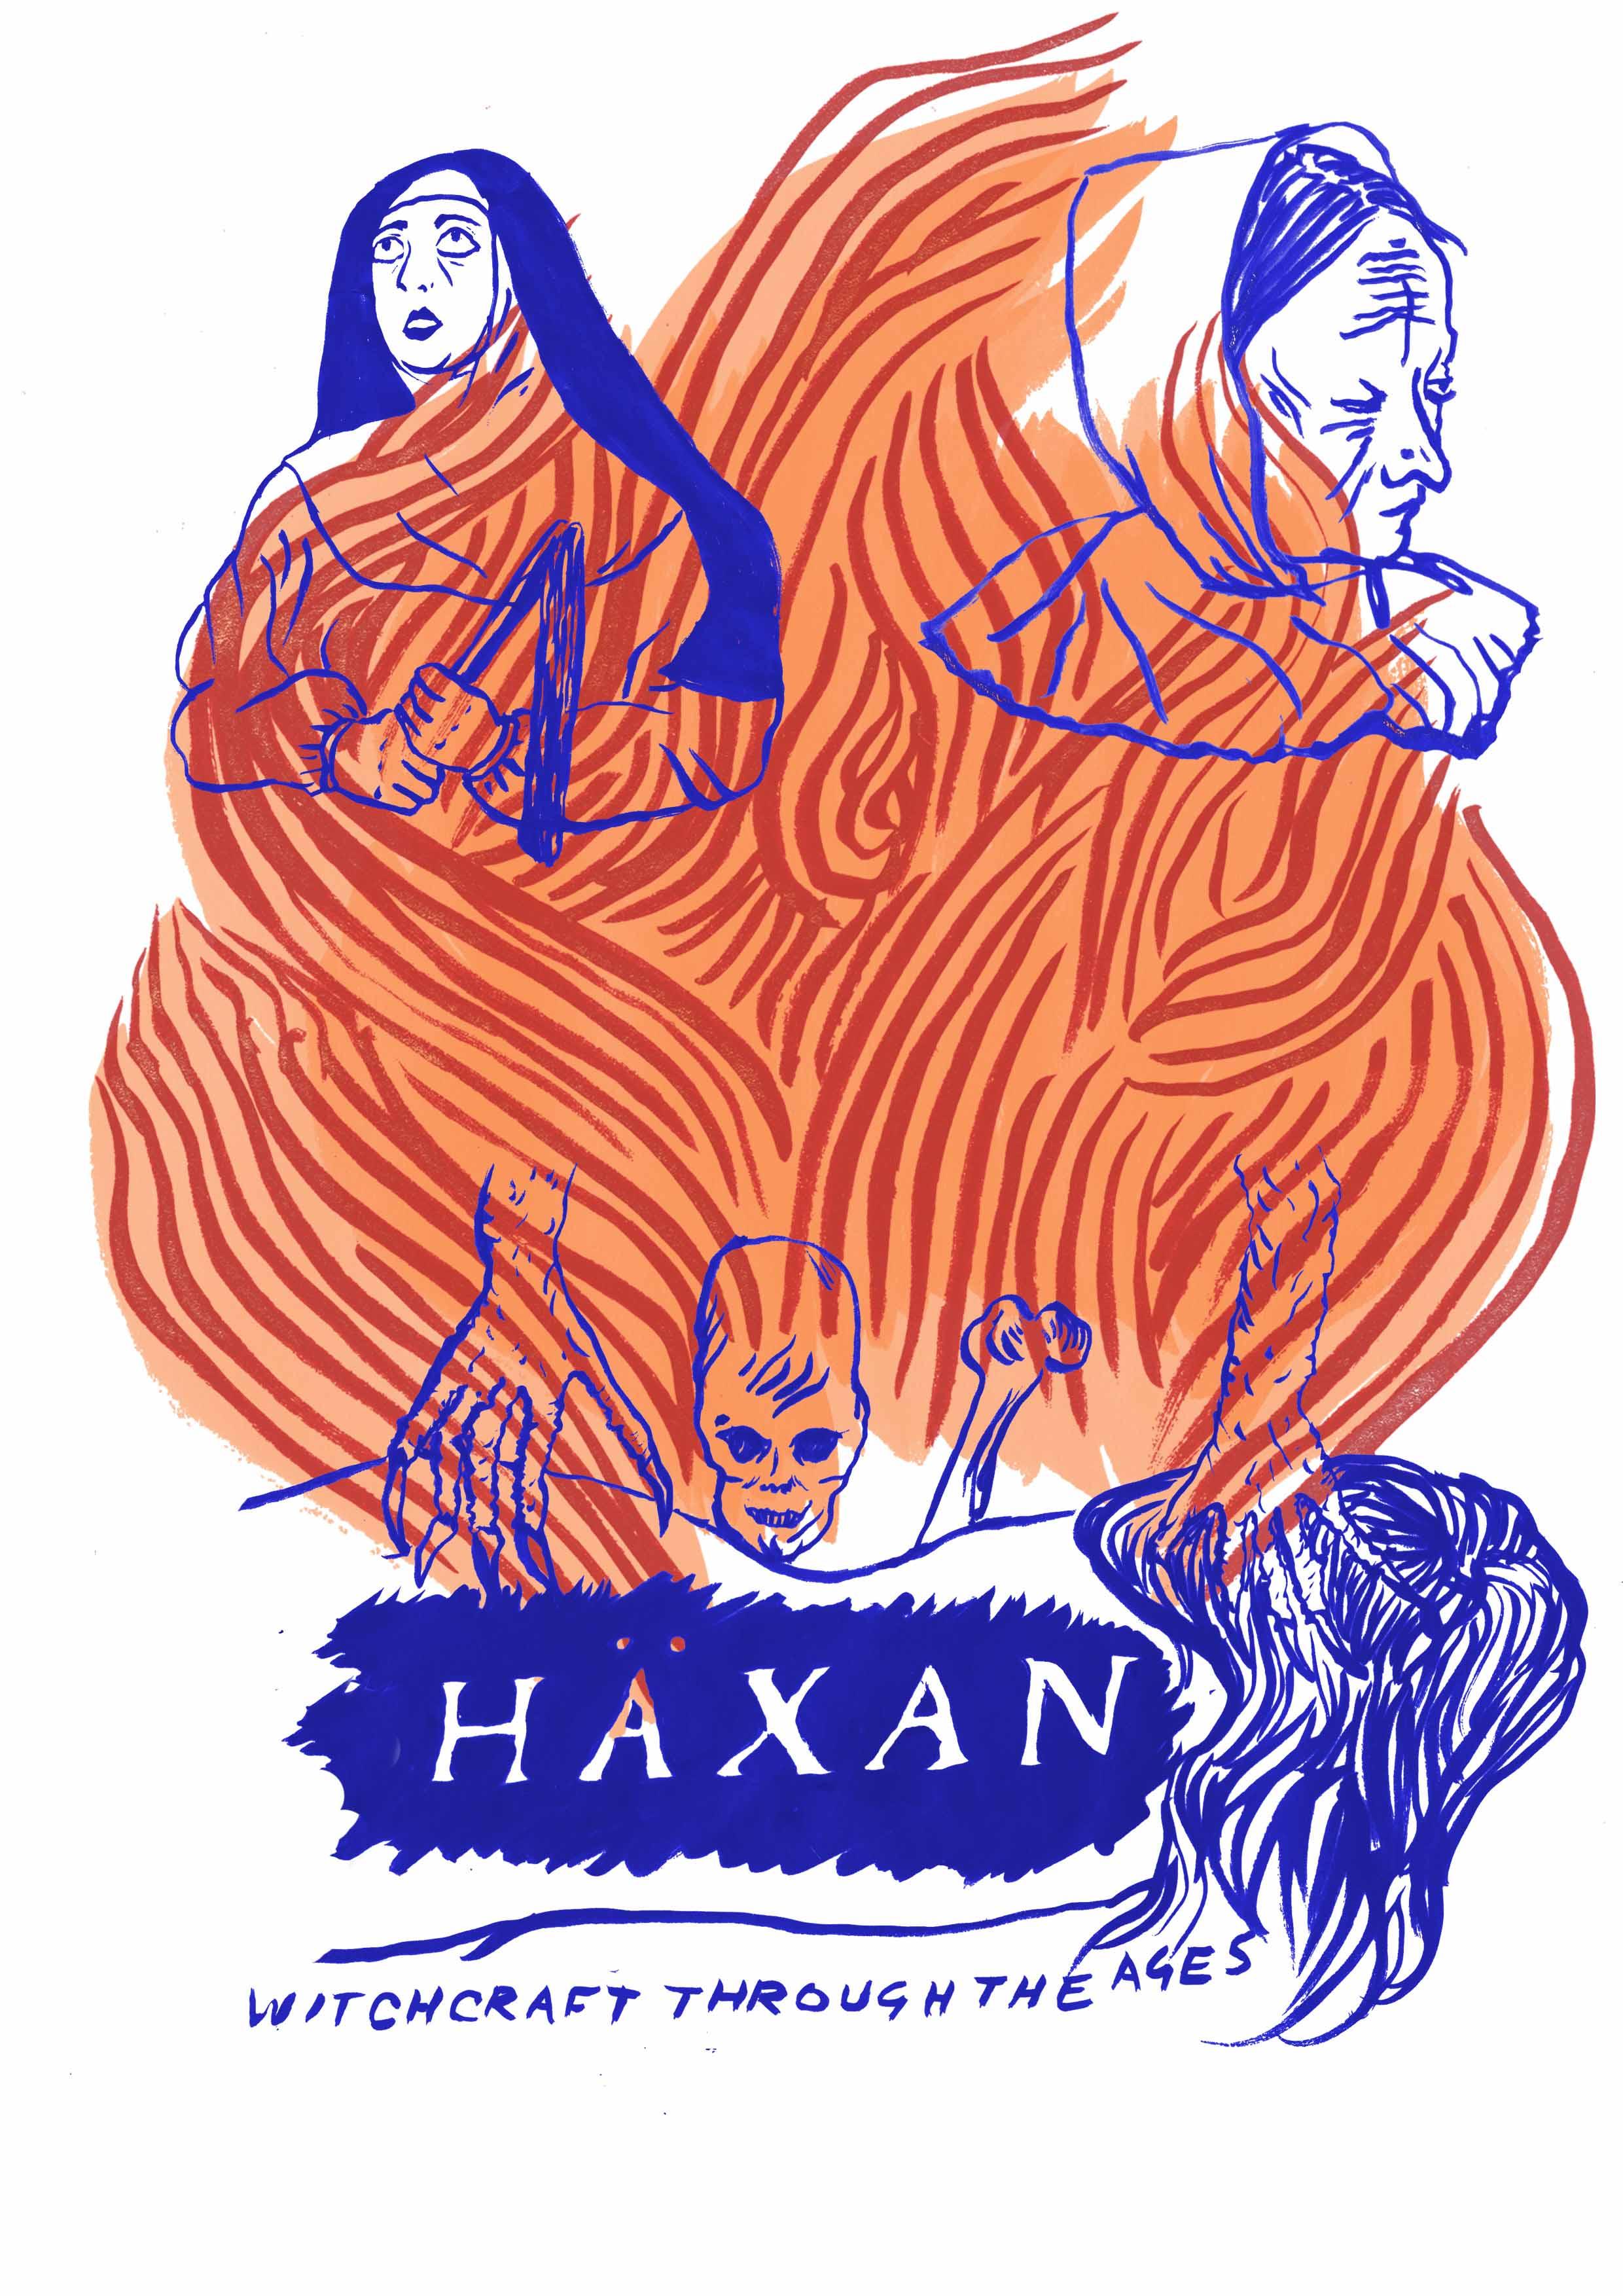 Haxan poster © Charlotte Procter charlotteprocter.tumblr.com